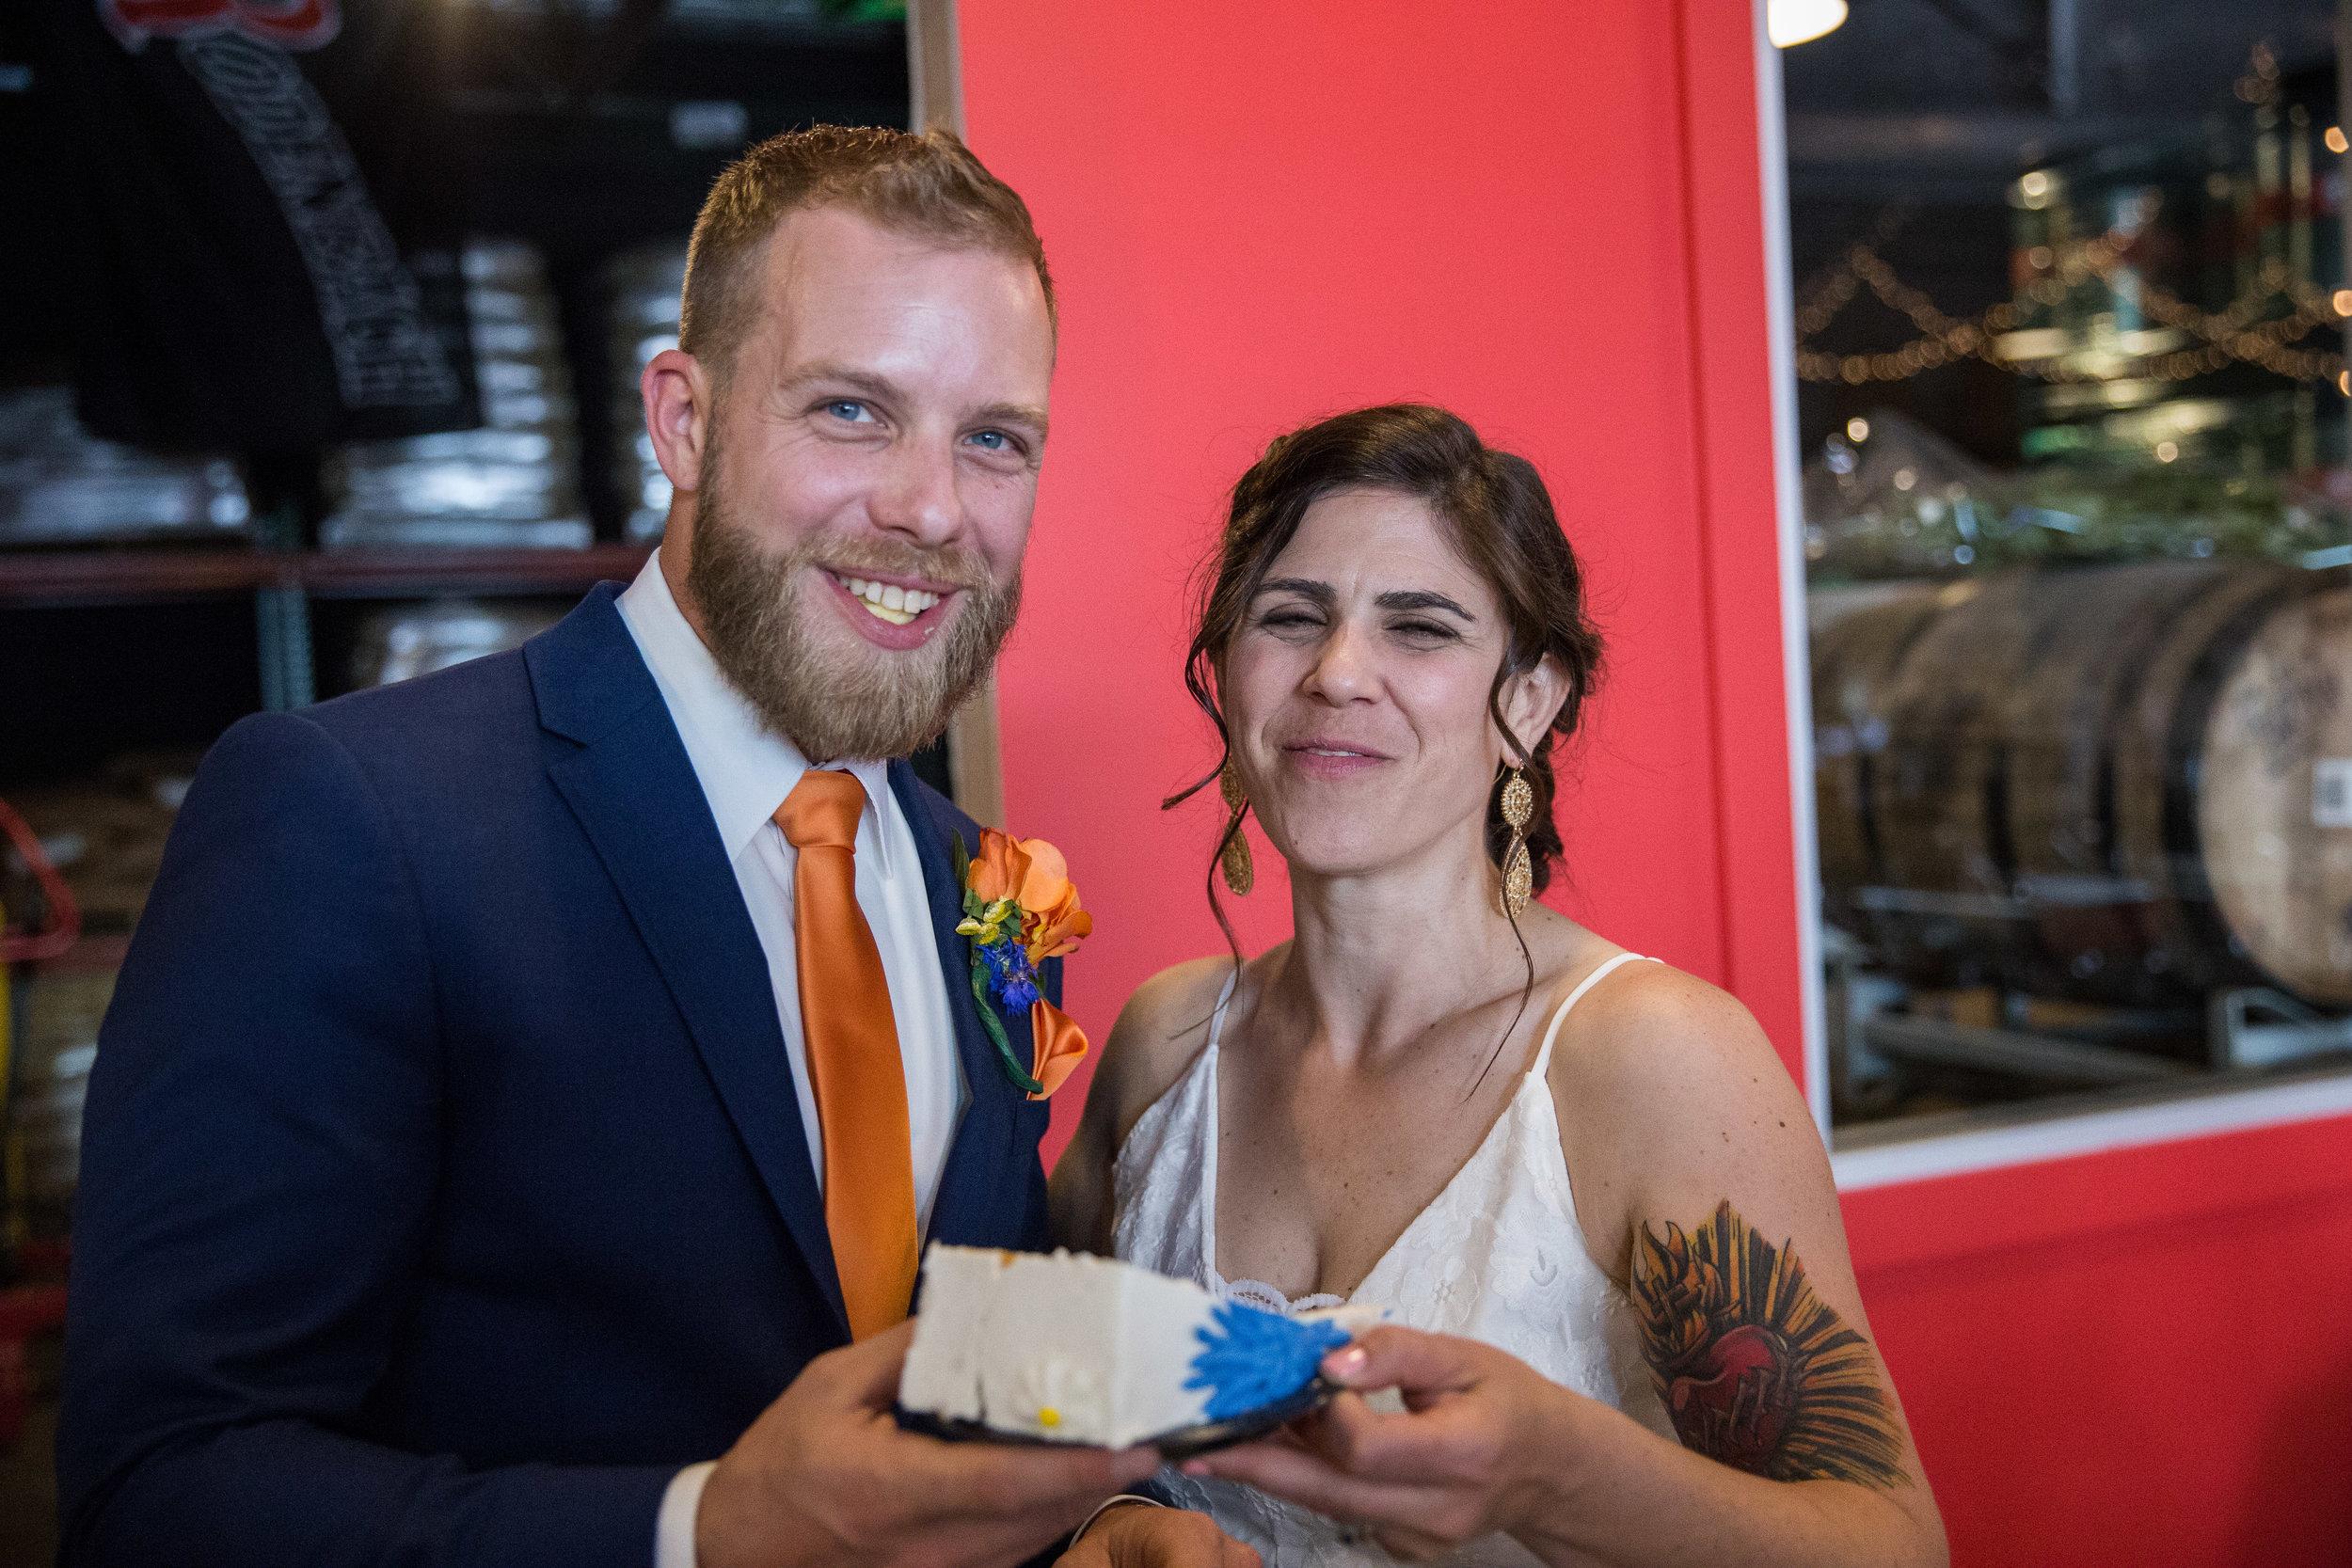 Natalie and Dallas Mooney Wedding 6-8-19_Tania Watt Photography-551.jpg